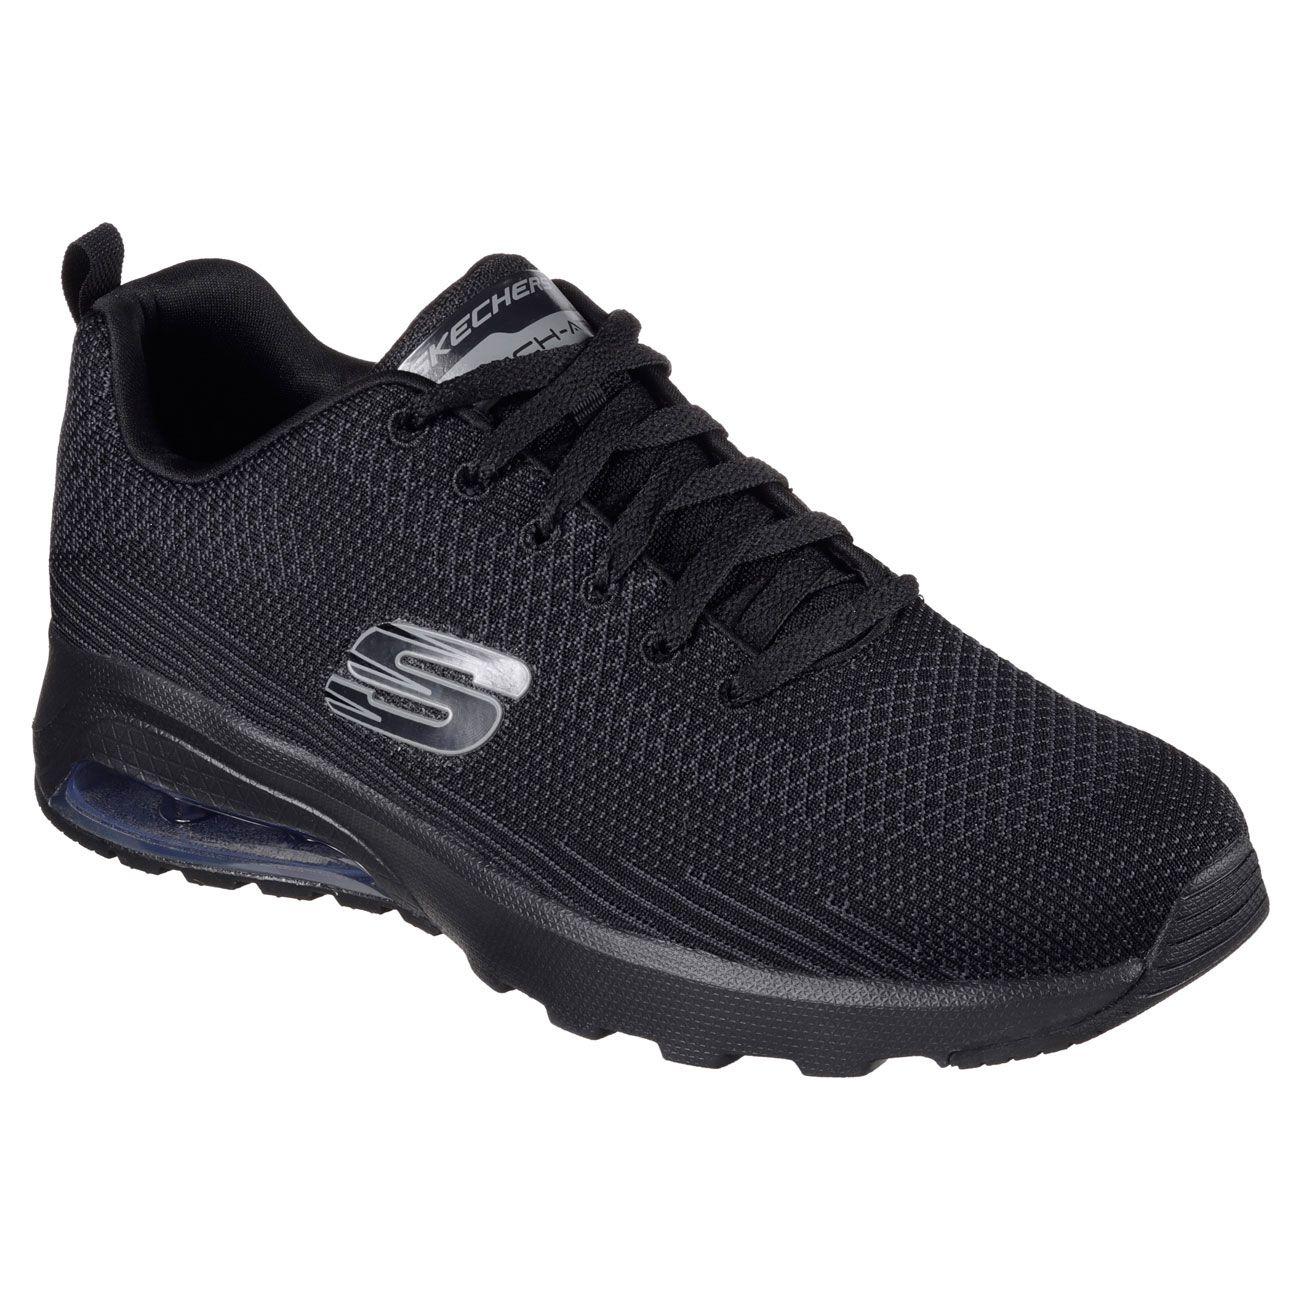 Skechers Skech Air Mens Training Shoes